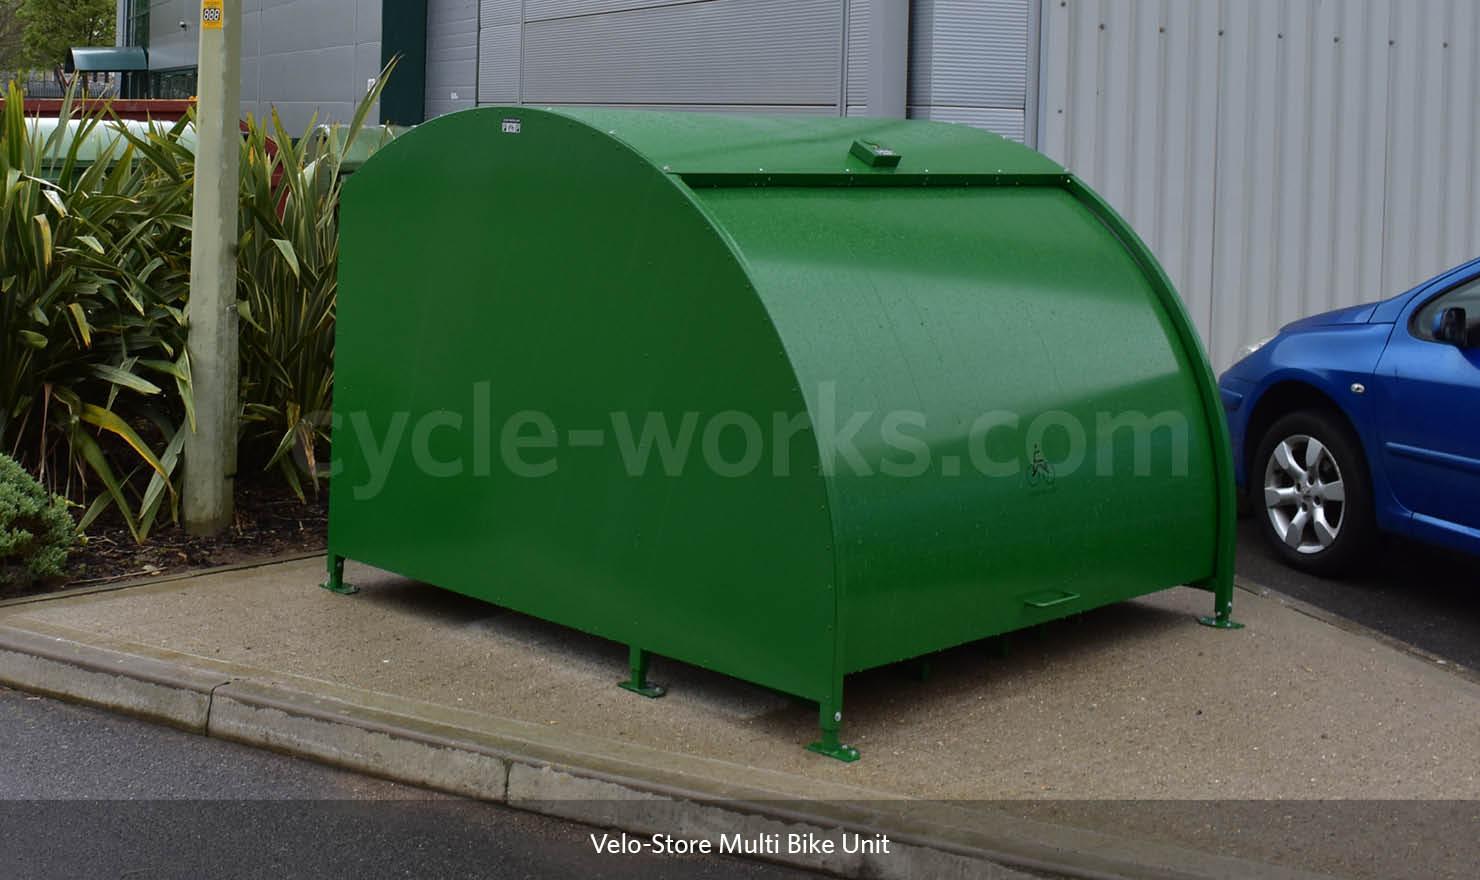 Velo-Store Bike Storage